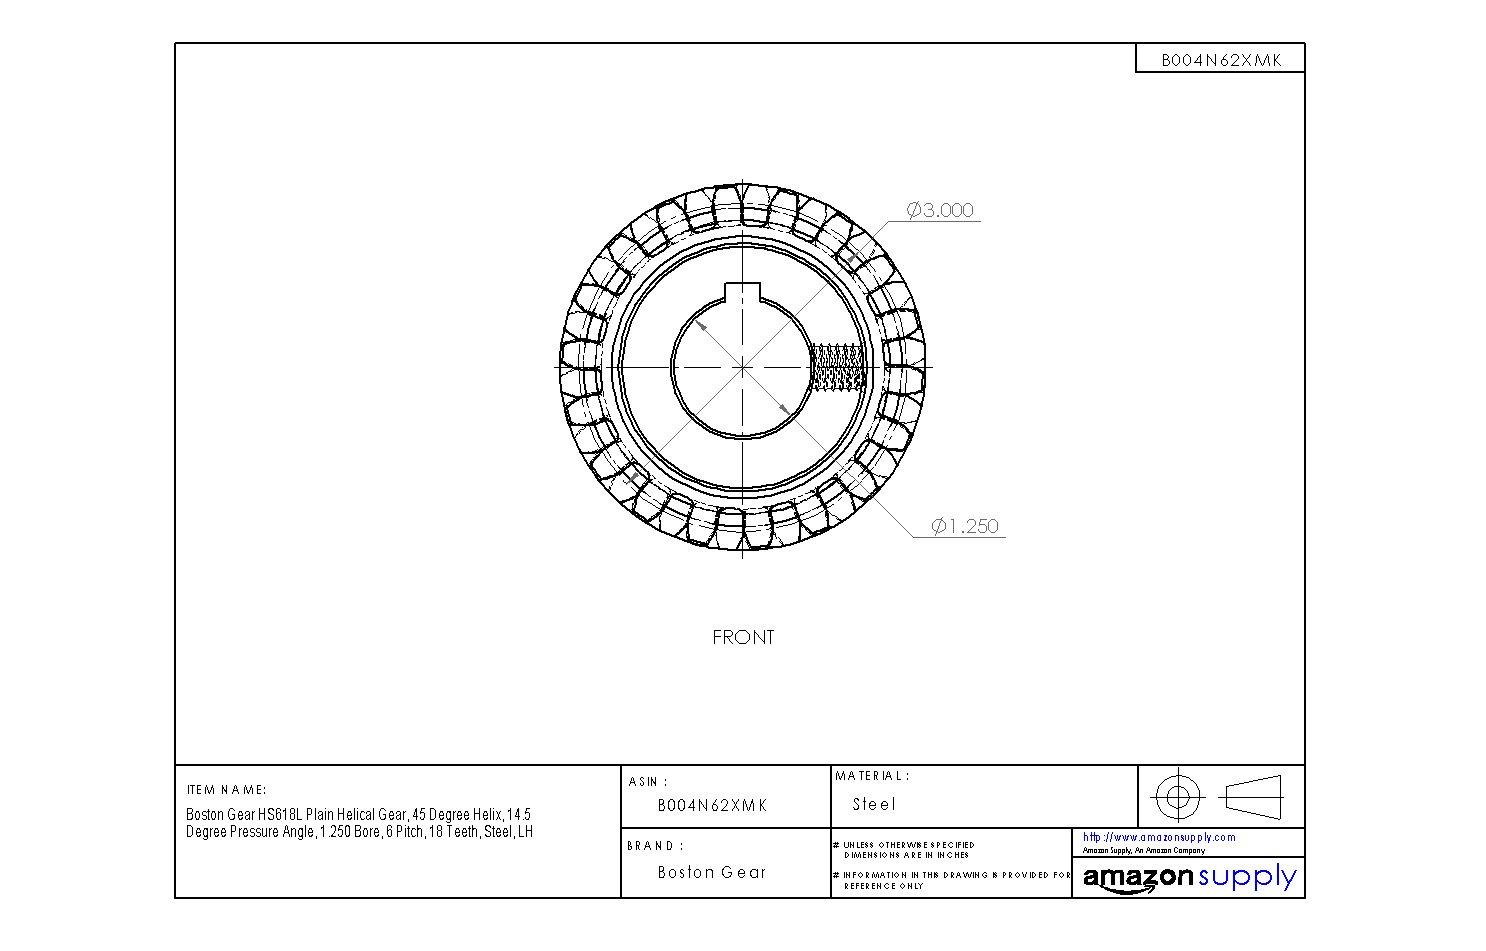 14.5 Degree Pressure Angle 18 Teeth Steel 45 Degree Helix 1.250 Bore LH Boston Gear HS618L Plain Helical Gear 6 Pitch